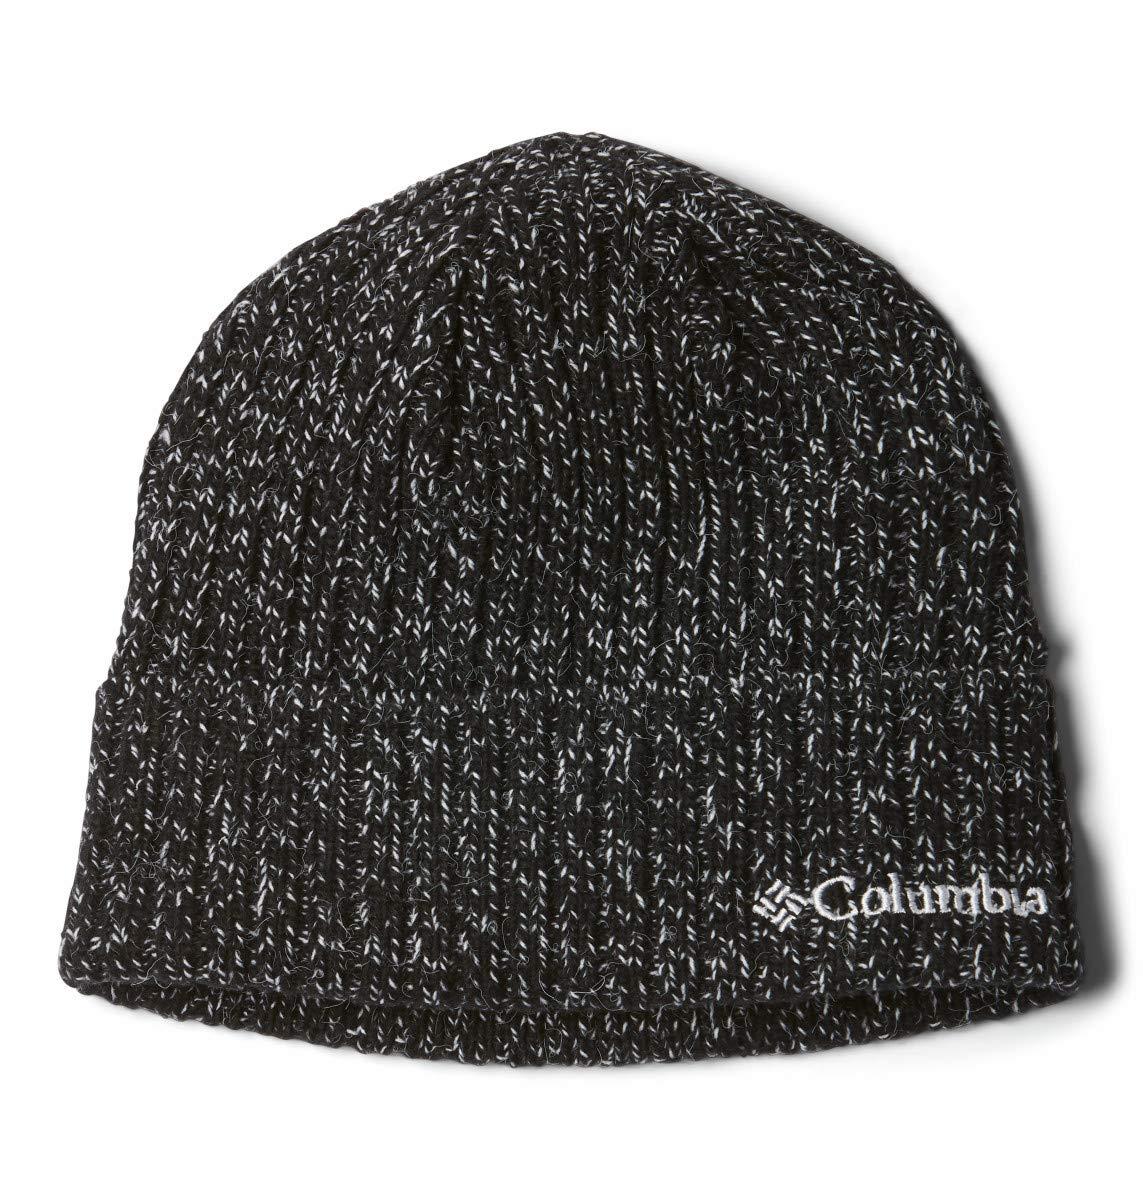 Columbia Watch Cap – Gorro para Hombre